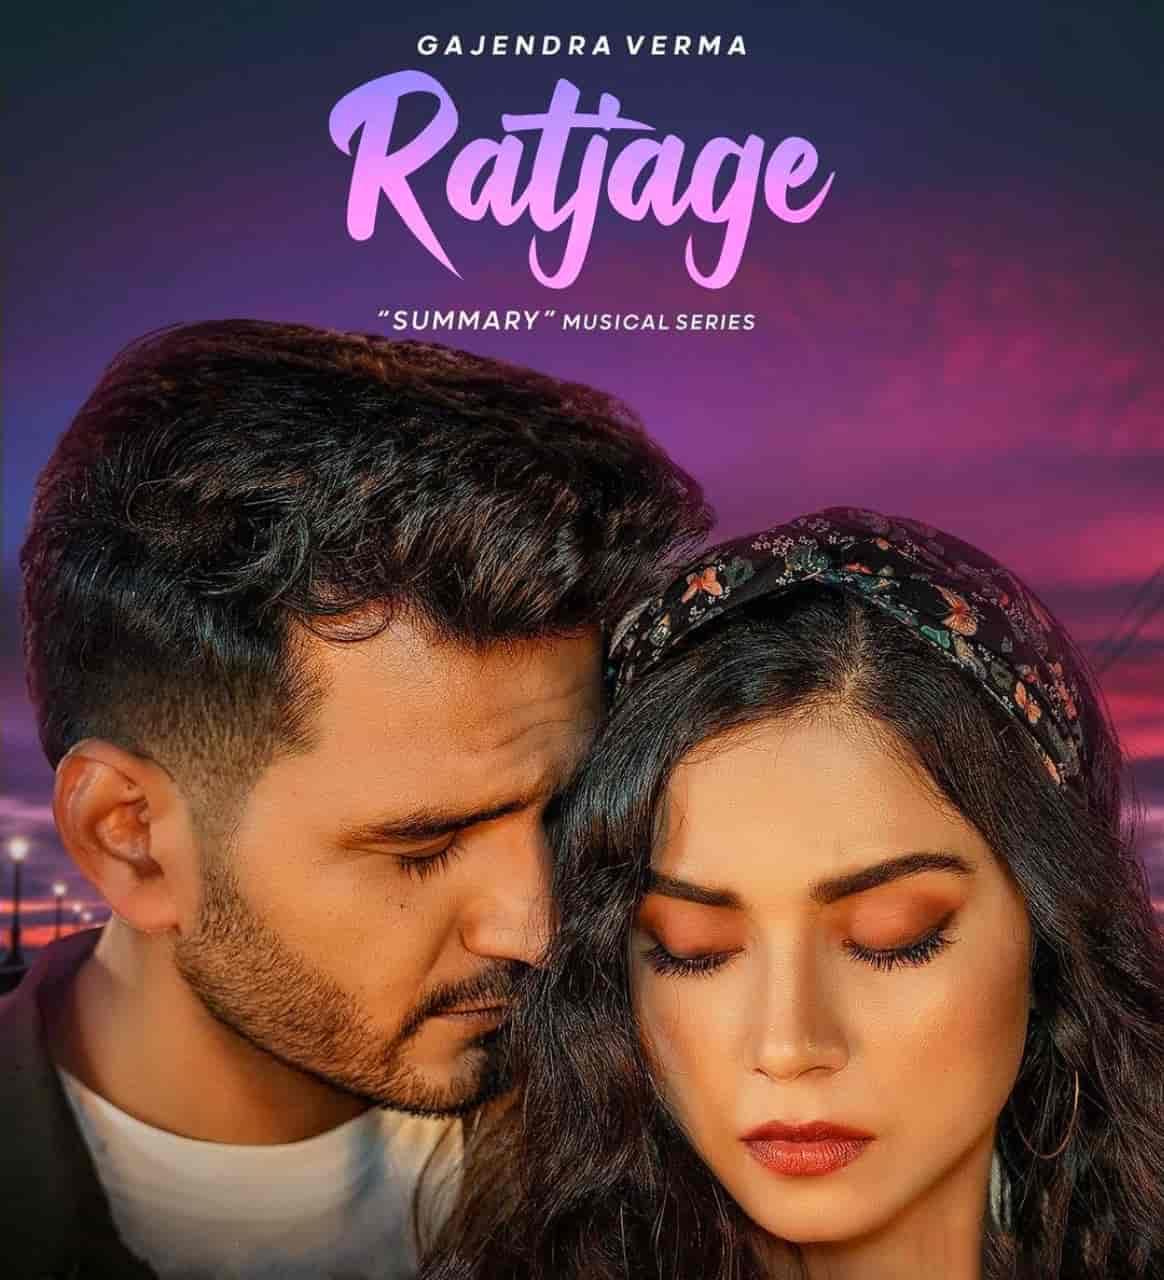 Ratjage Lyrics Gajendra Verma